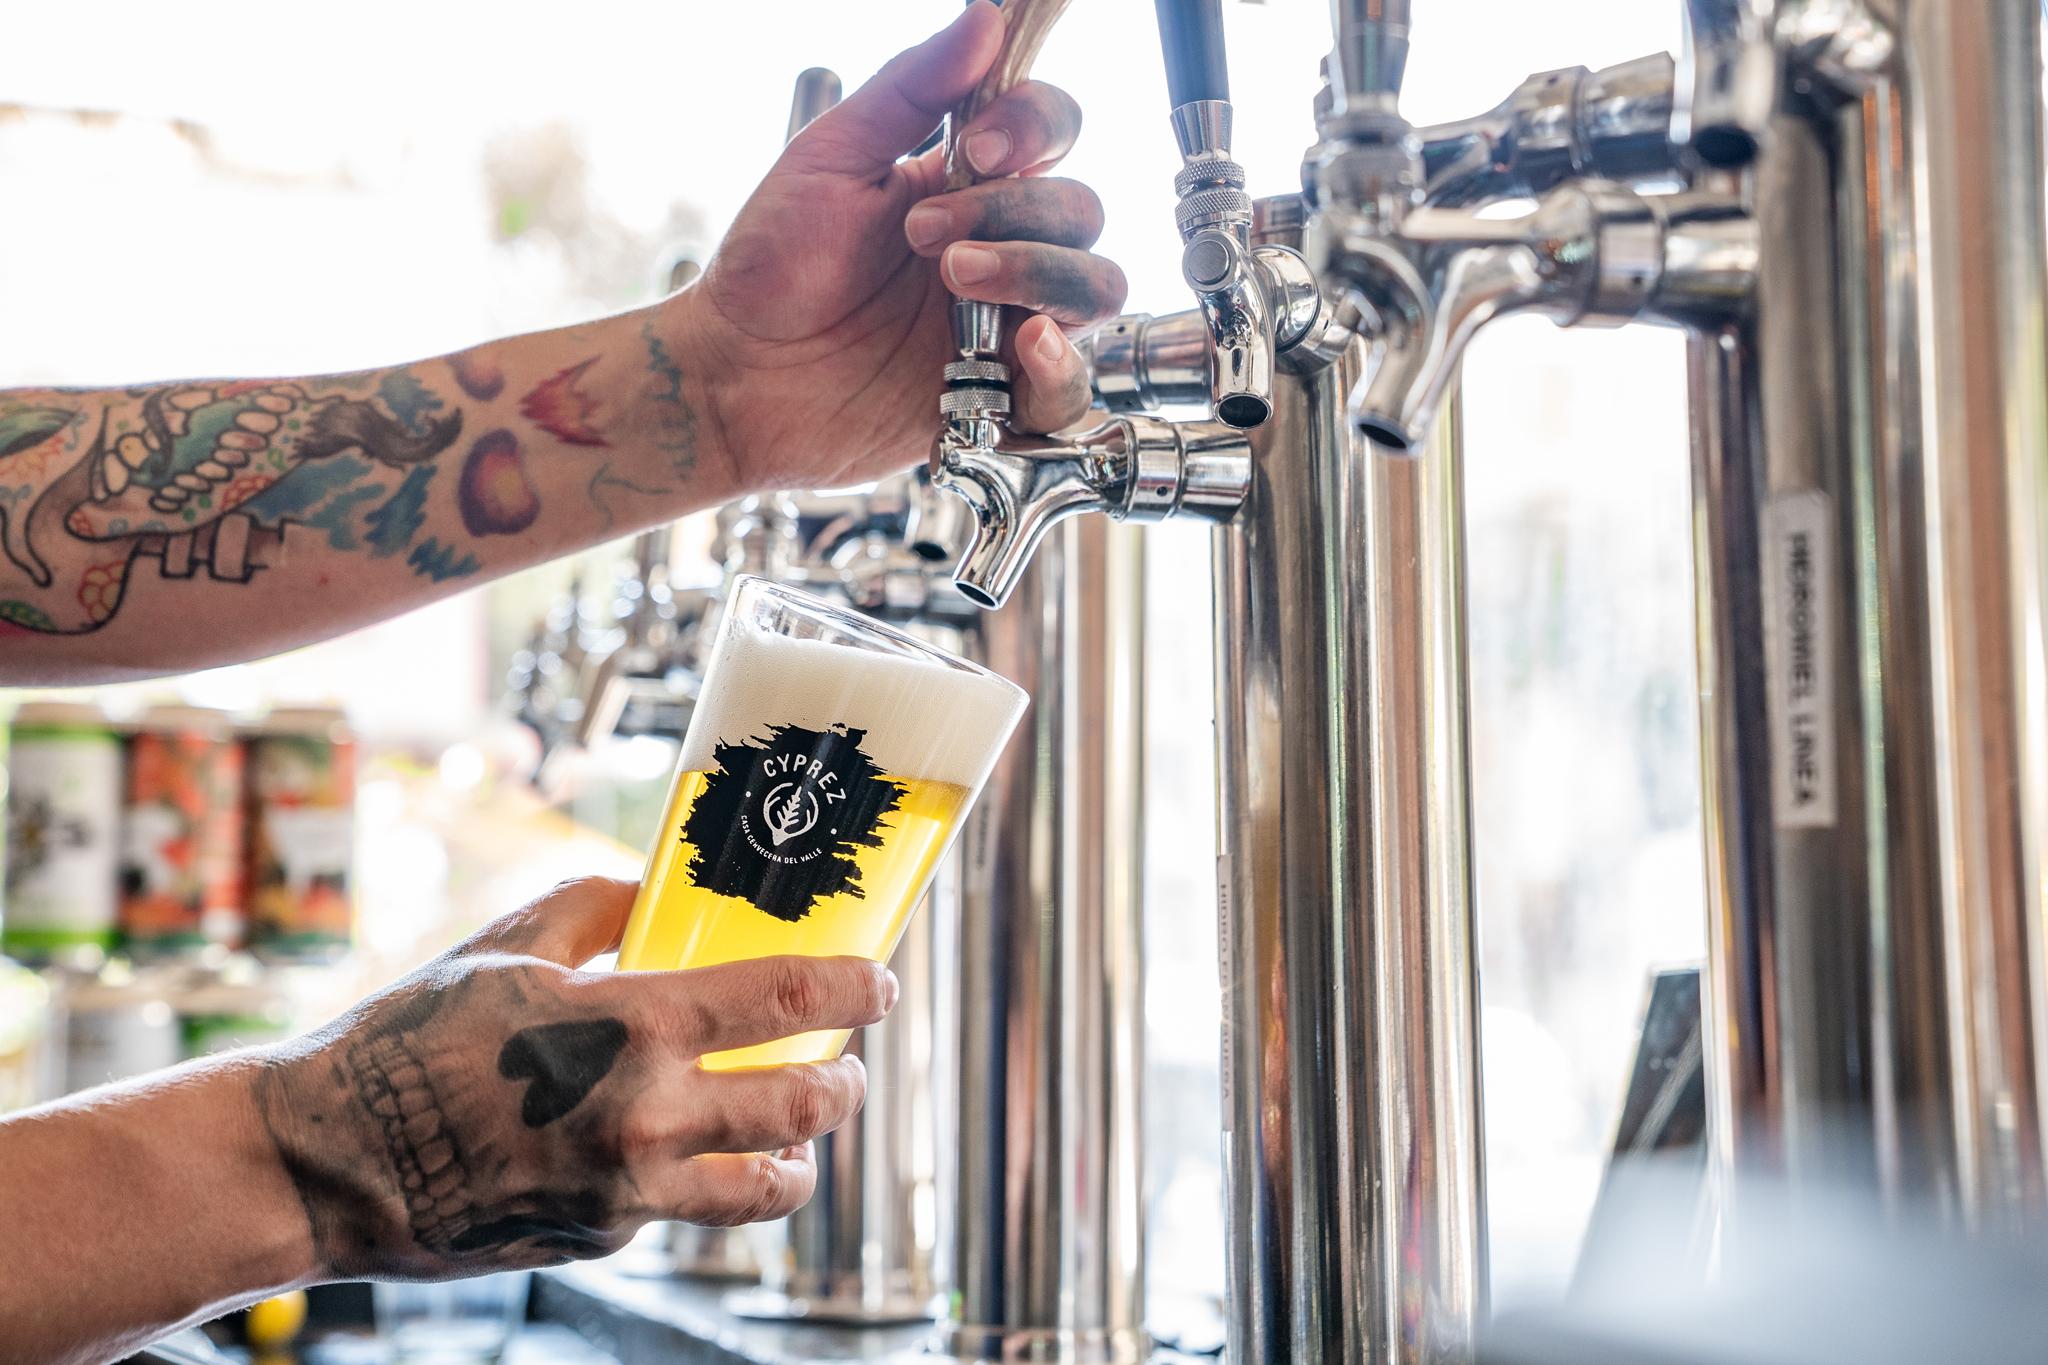 Cyprez Tap room cerveza artesanal de la CDMX